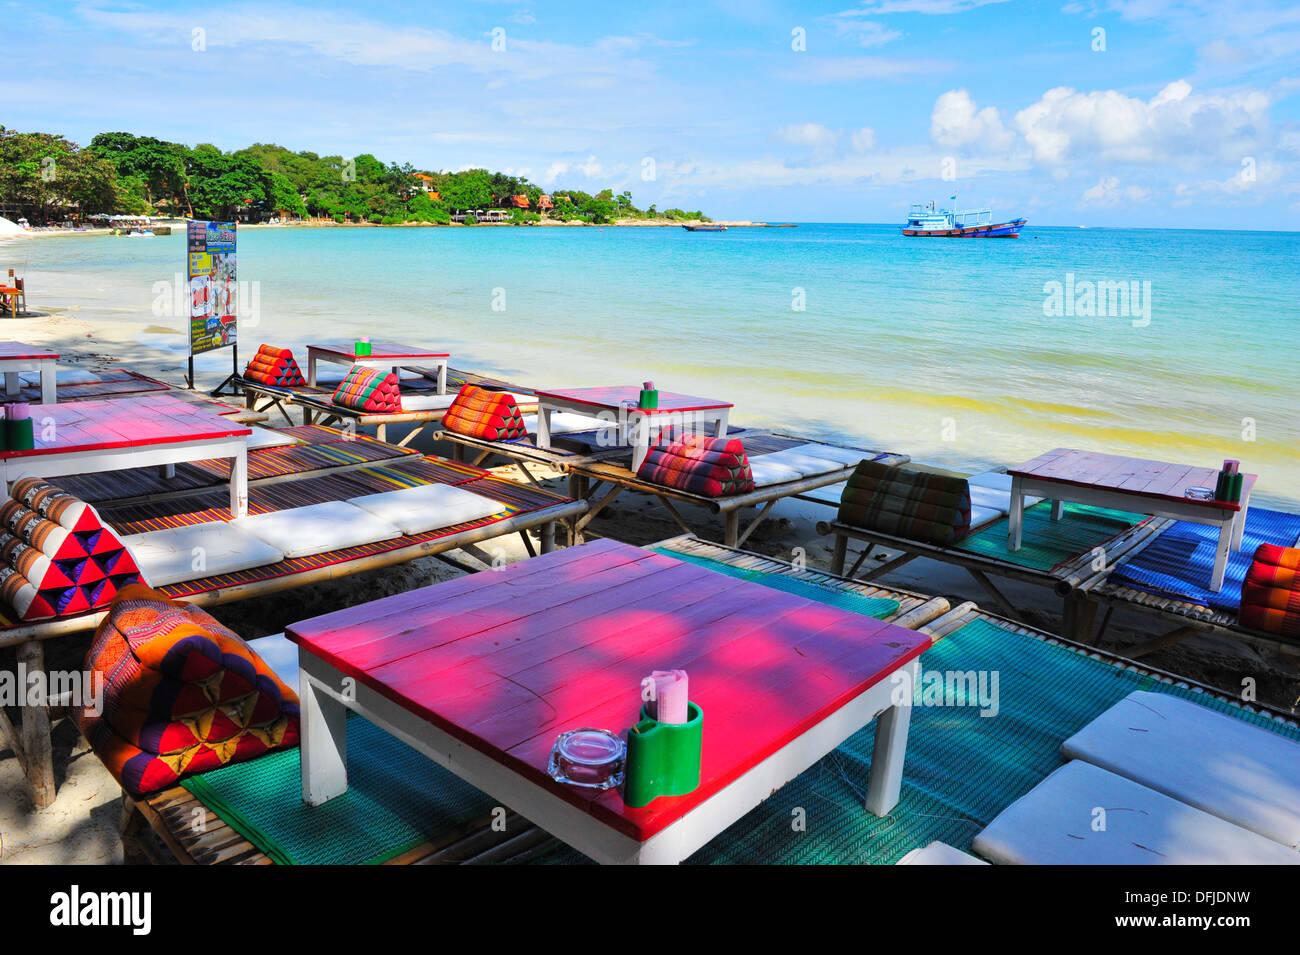 Koh Samet Beach In Thailand Stock Photos Koh Samet Beach